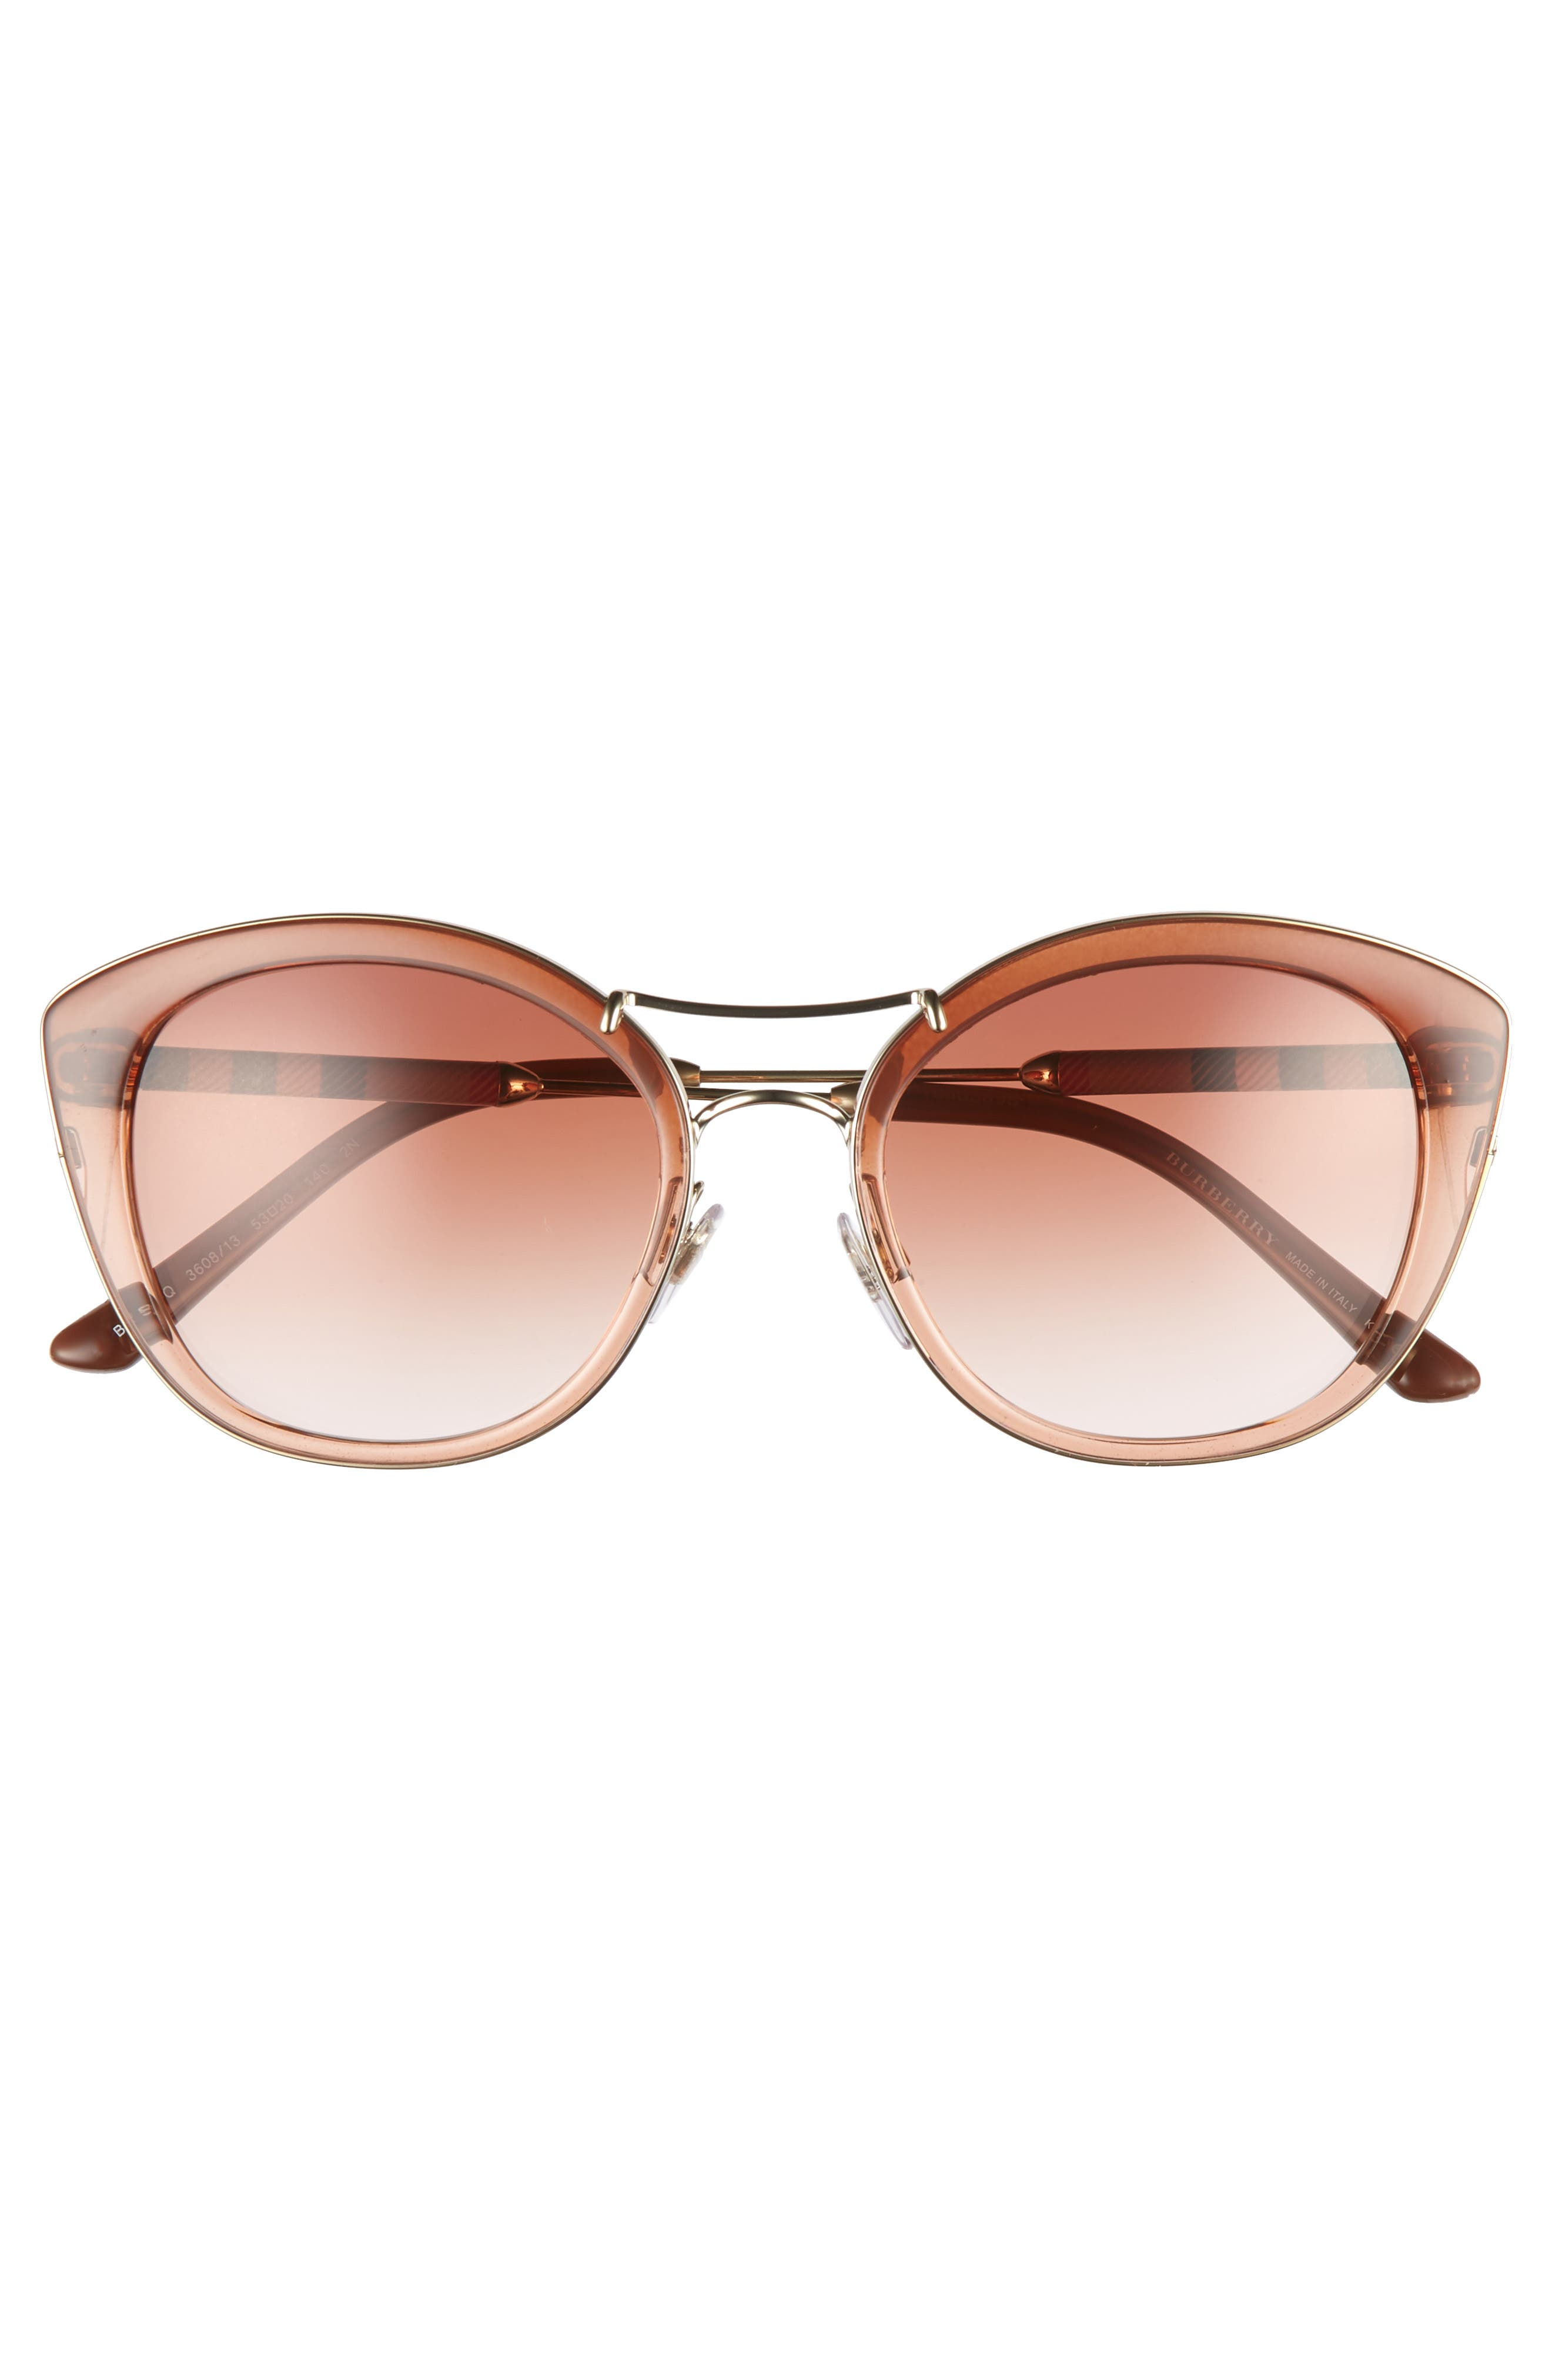 53mm Gradient Sunglasses,                             Alternate thumbnail 3, color,                             BROWN GRADIENT